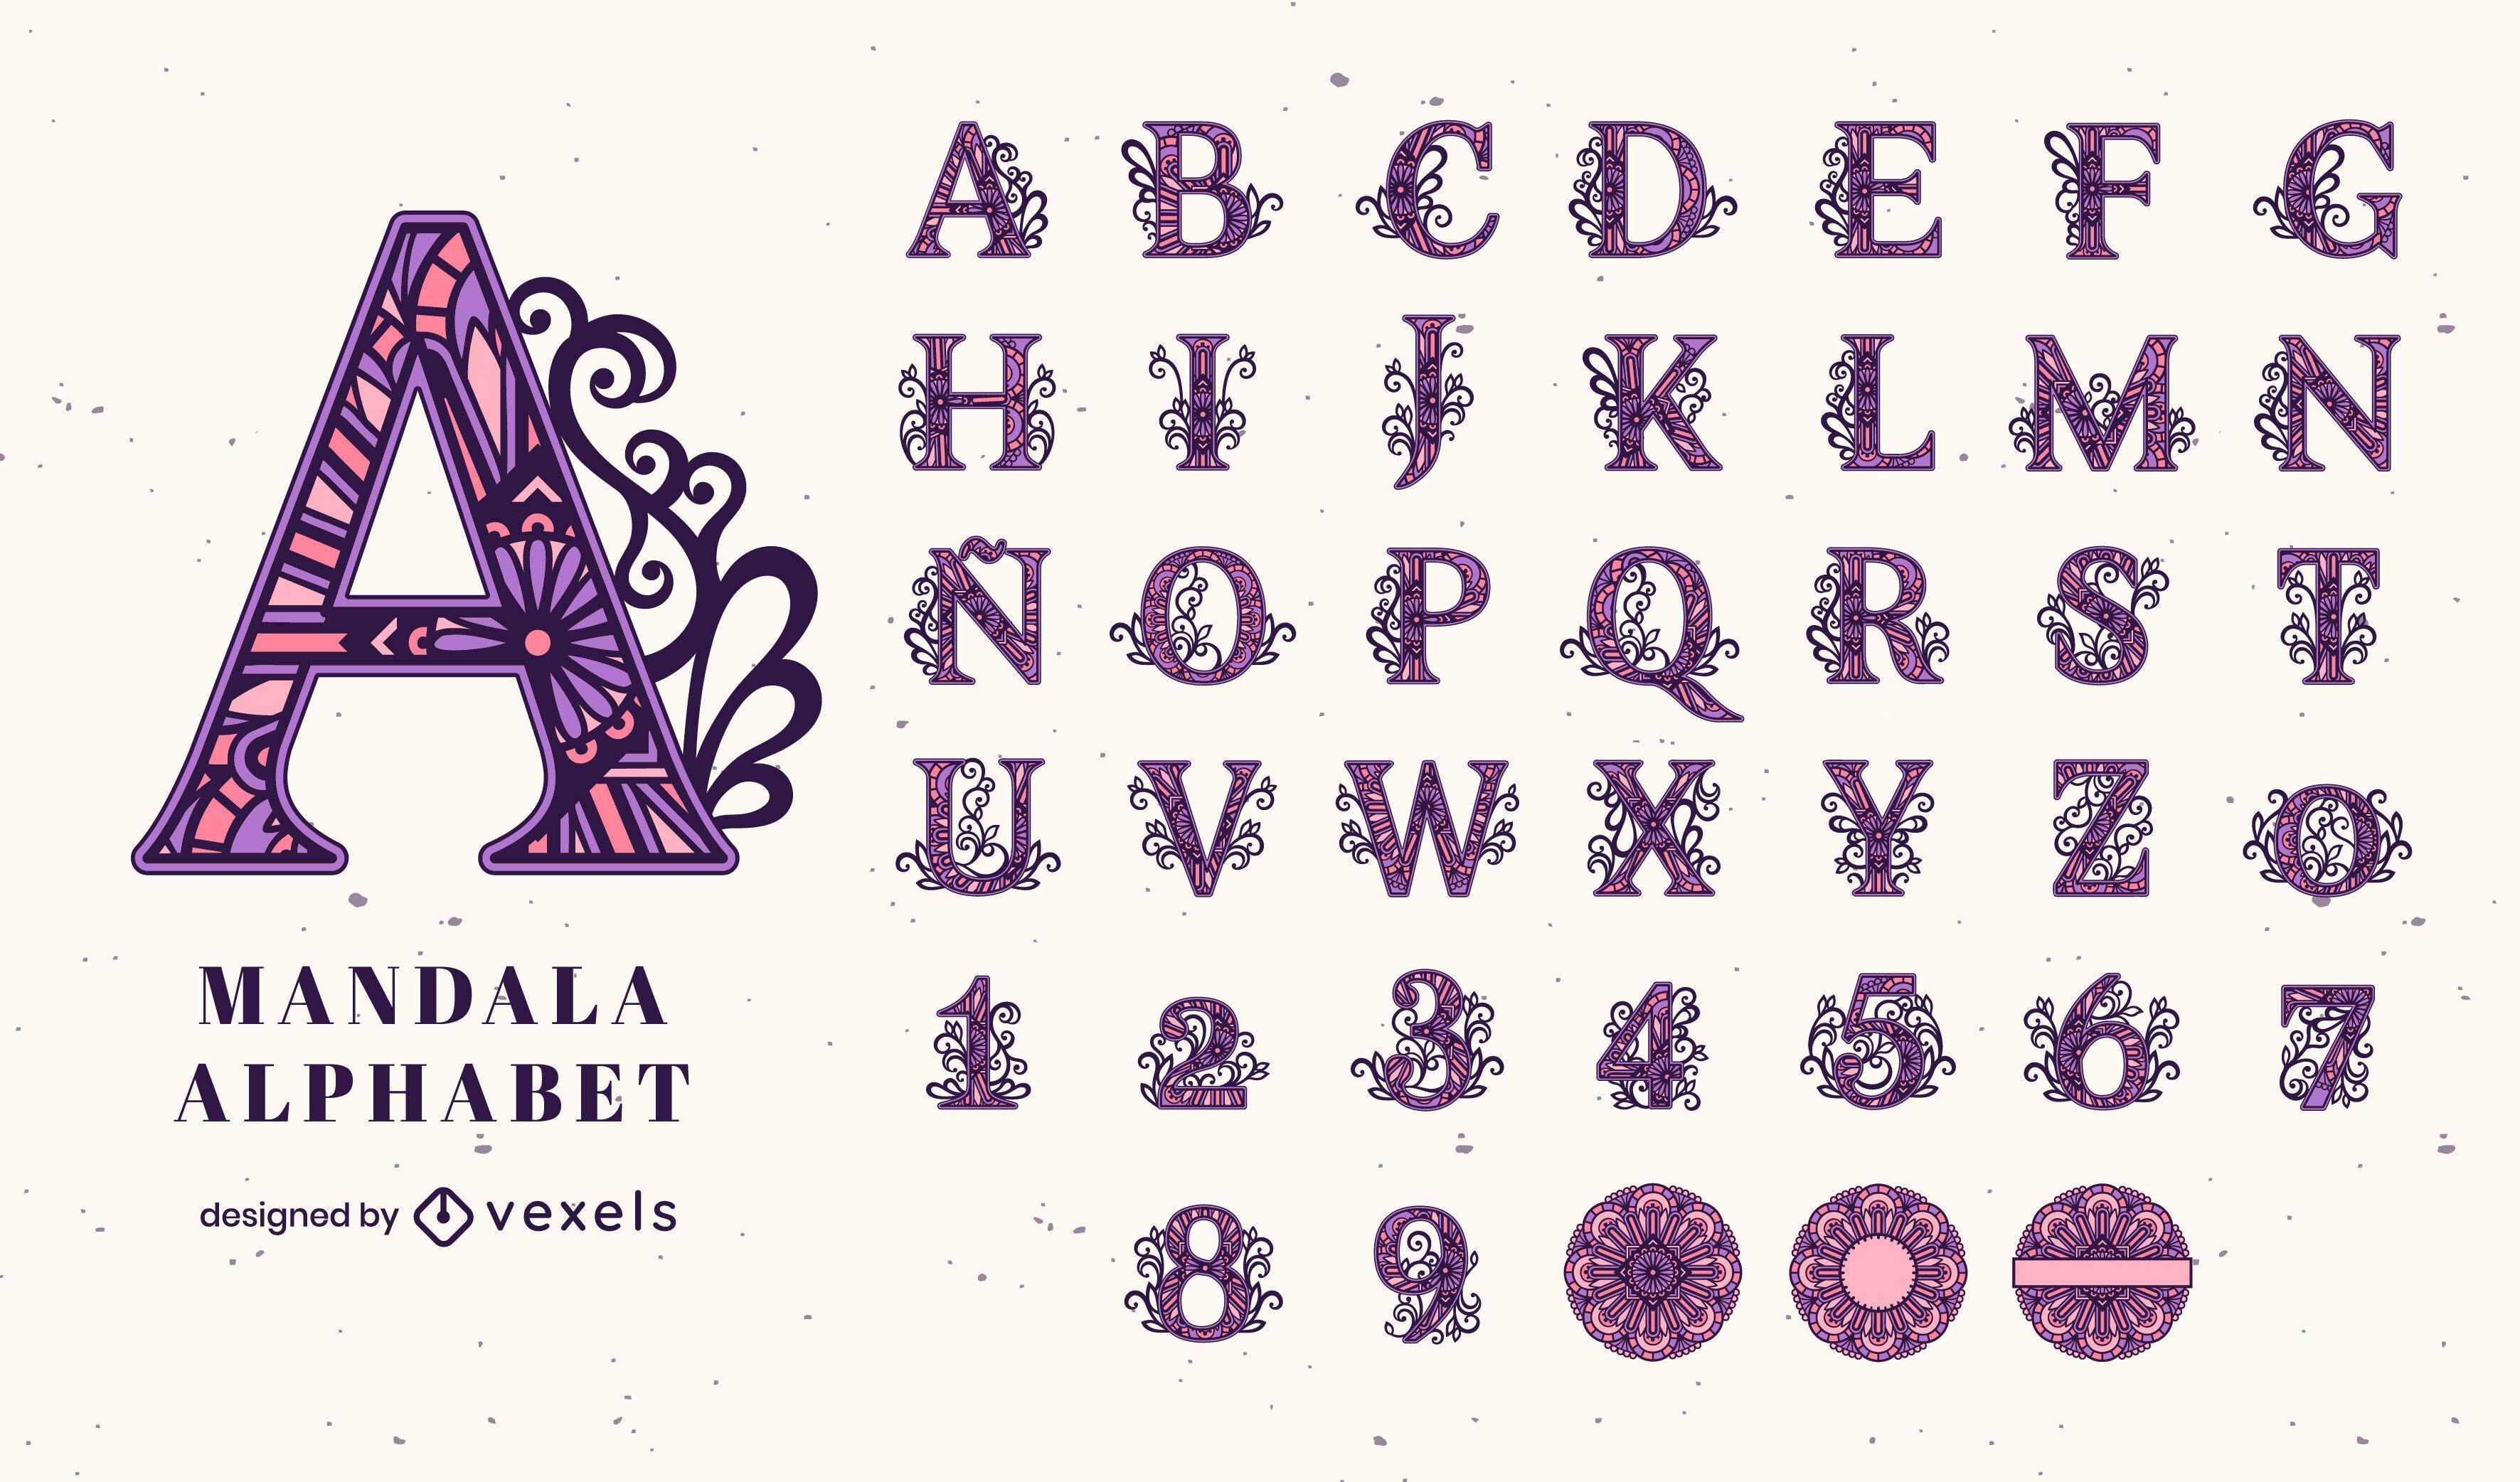 Mandala color stroke themed alphabet